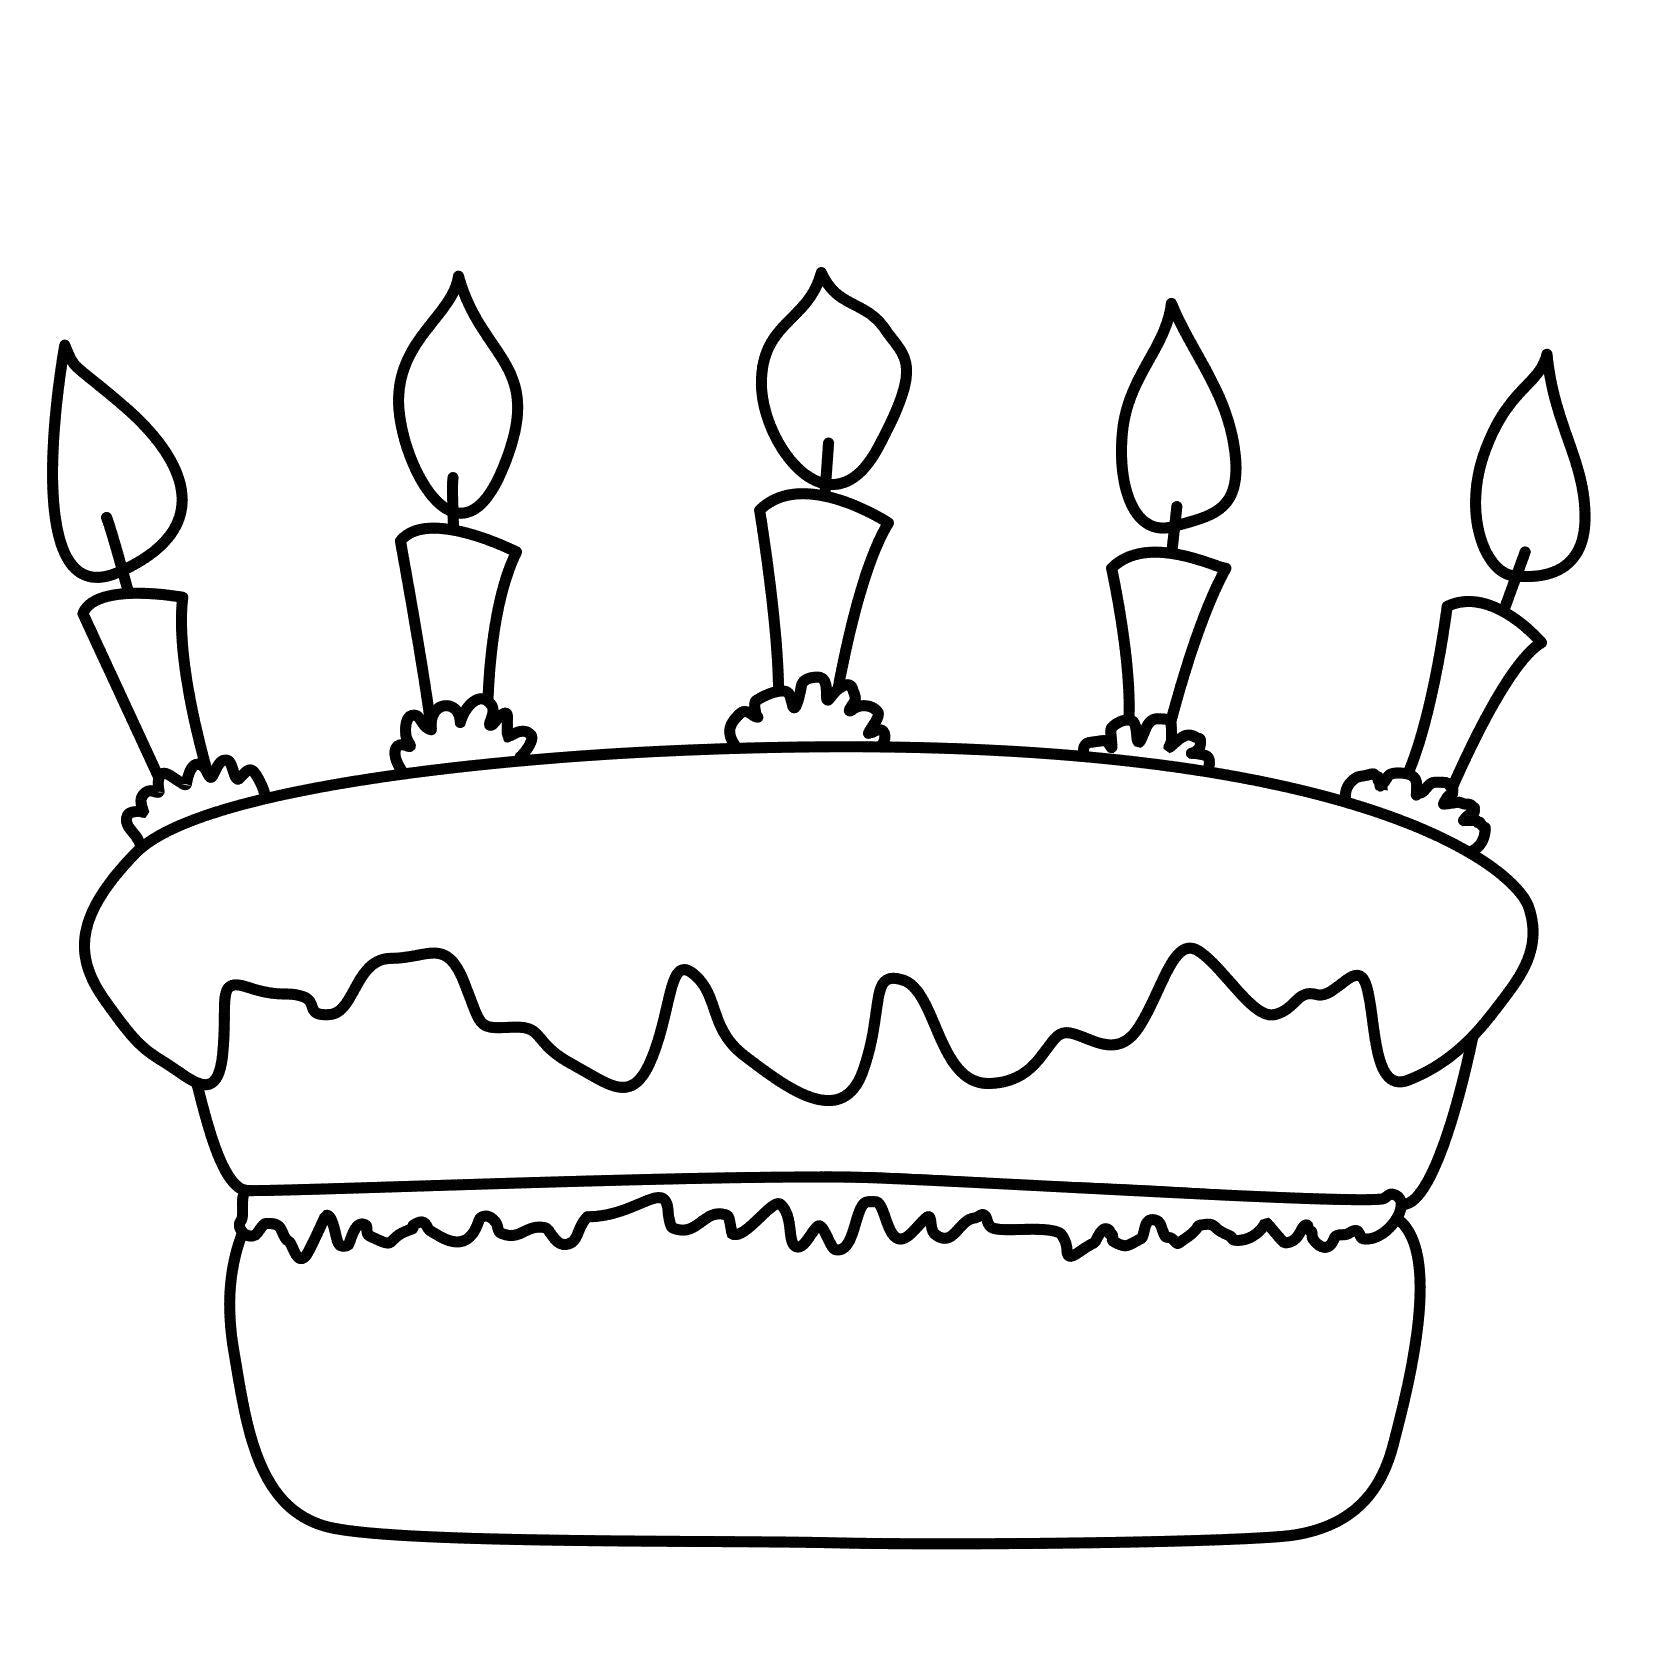 шаблон картинки торта устройства